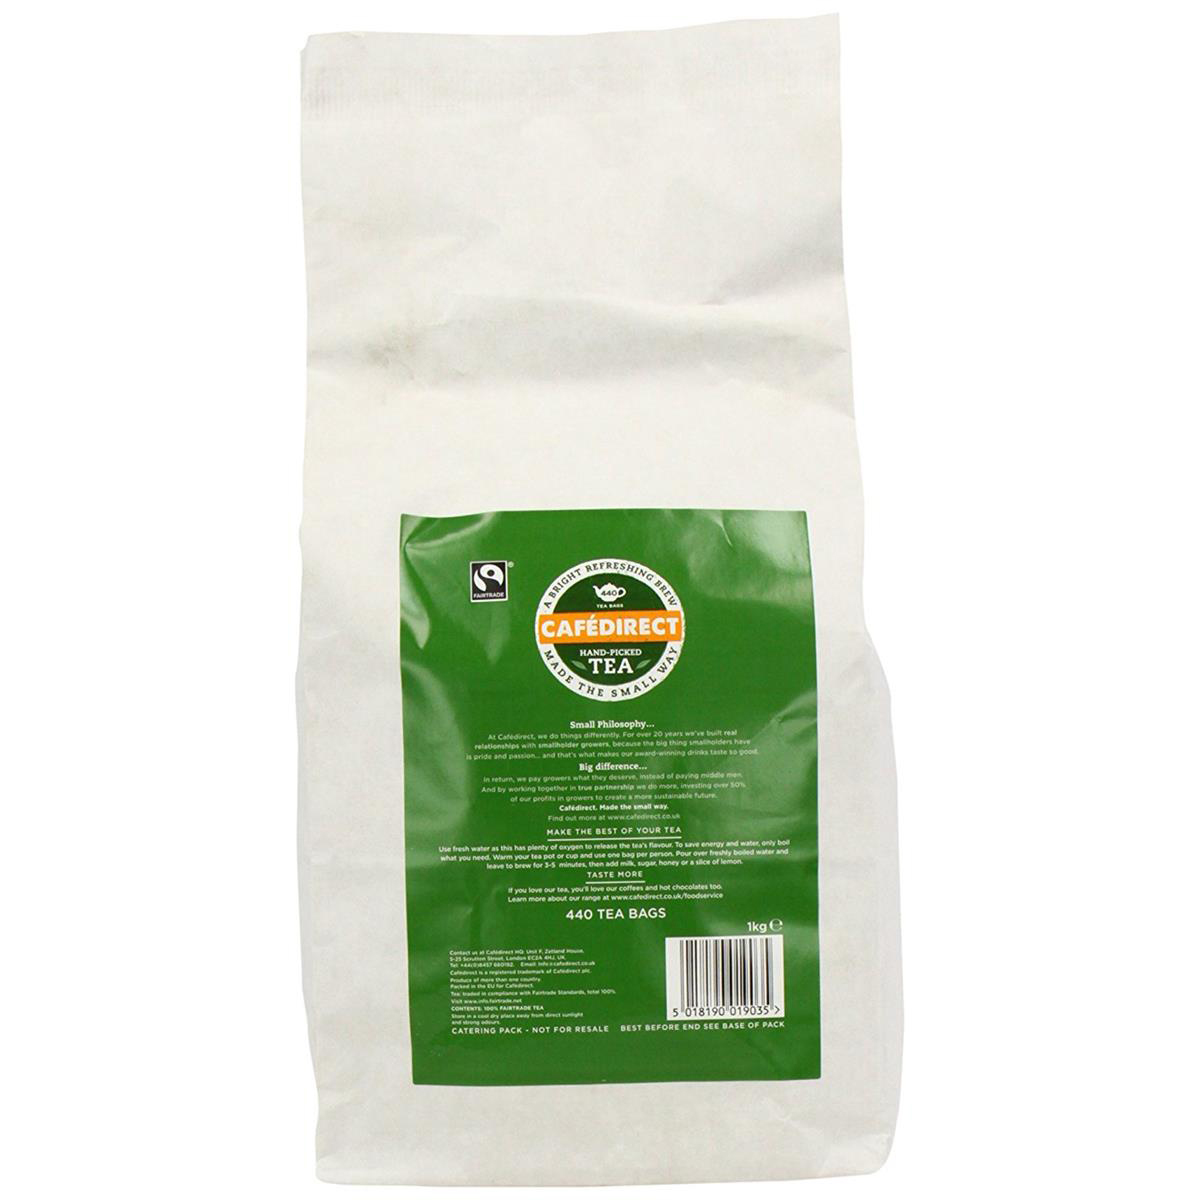 Cafedirect Everyday Tea Bags Pk440